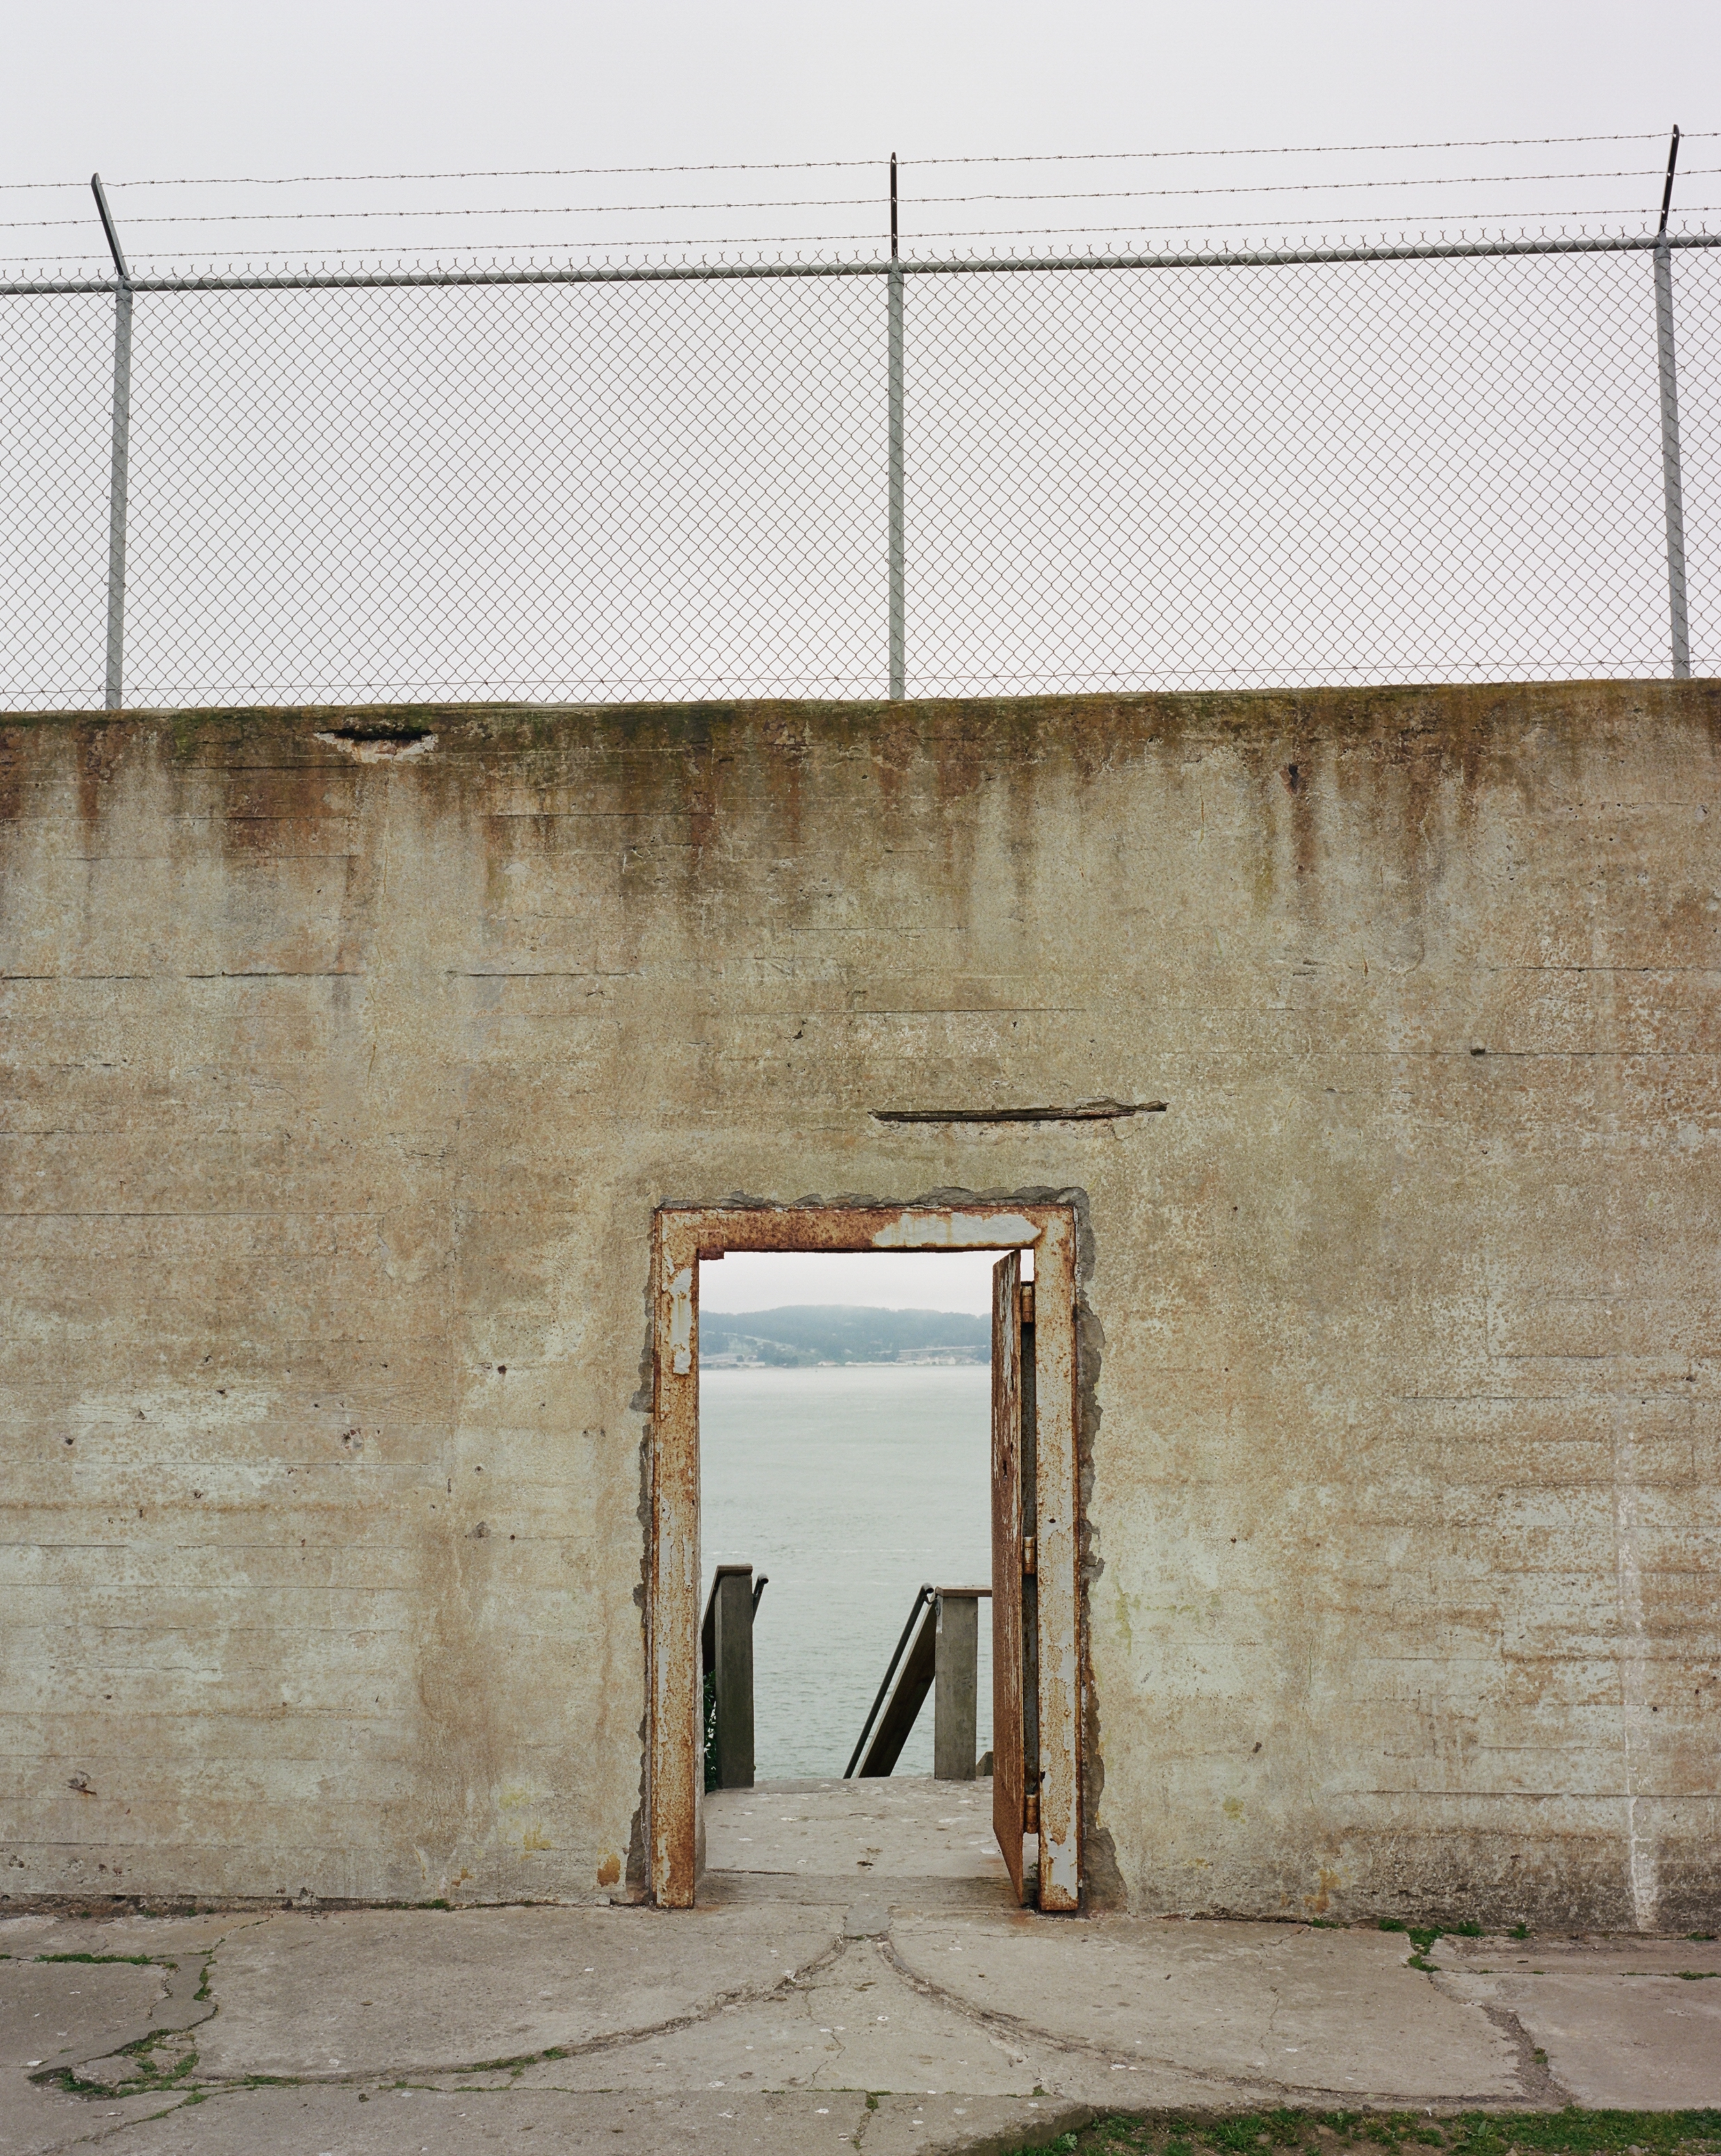 Frame 6  The Yard